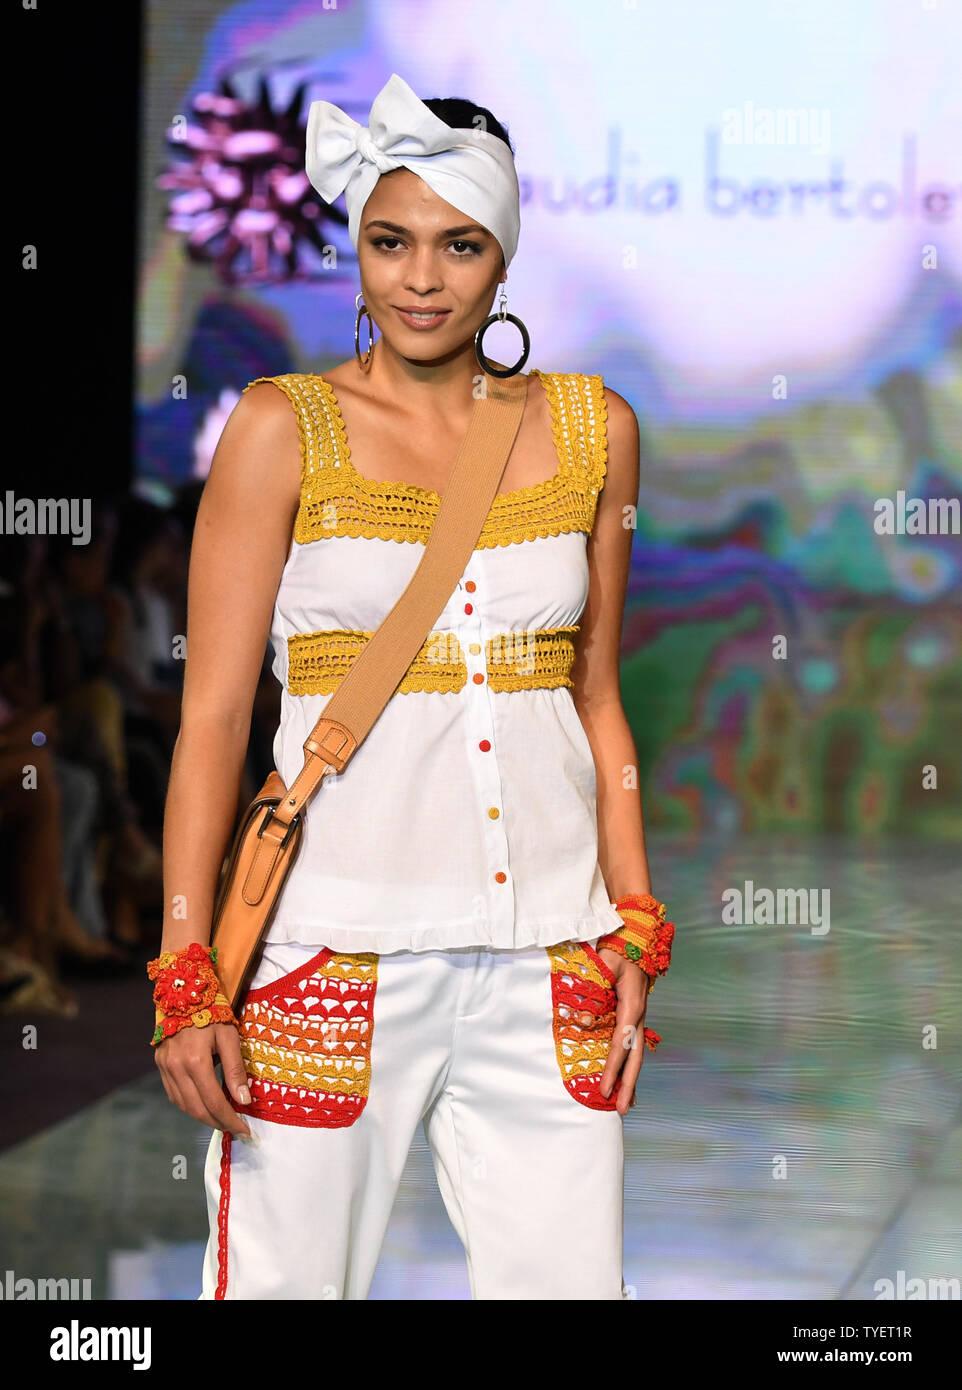 A Model Presents A Beachwear Creation By Claudia Bertolero Fashion Designers During The Miami Fashion Week